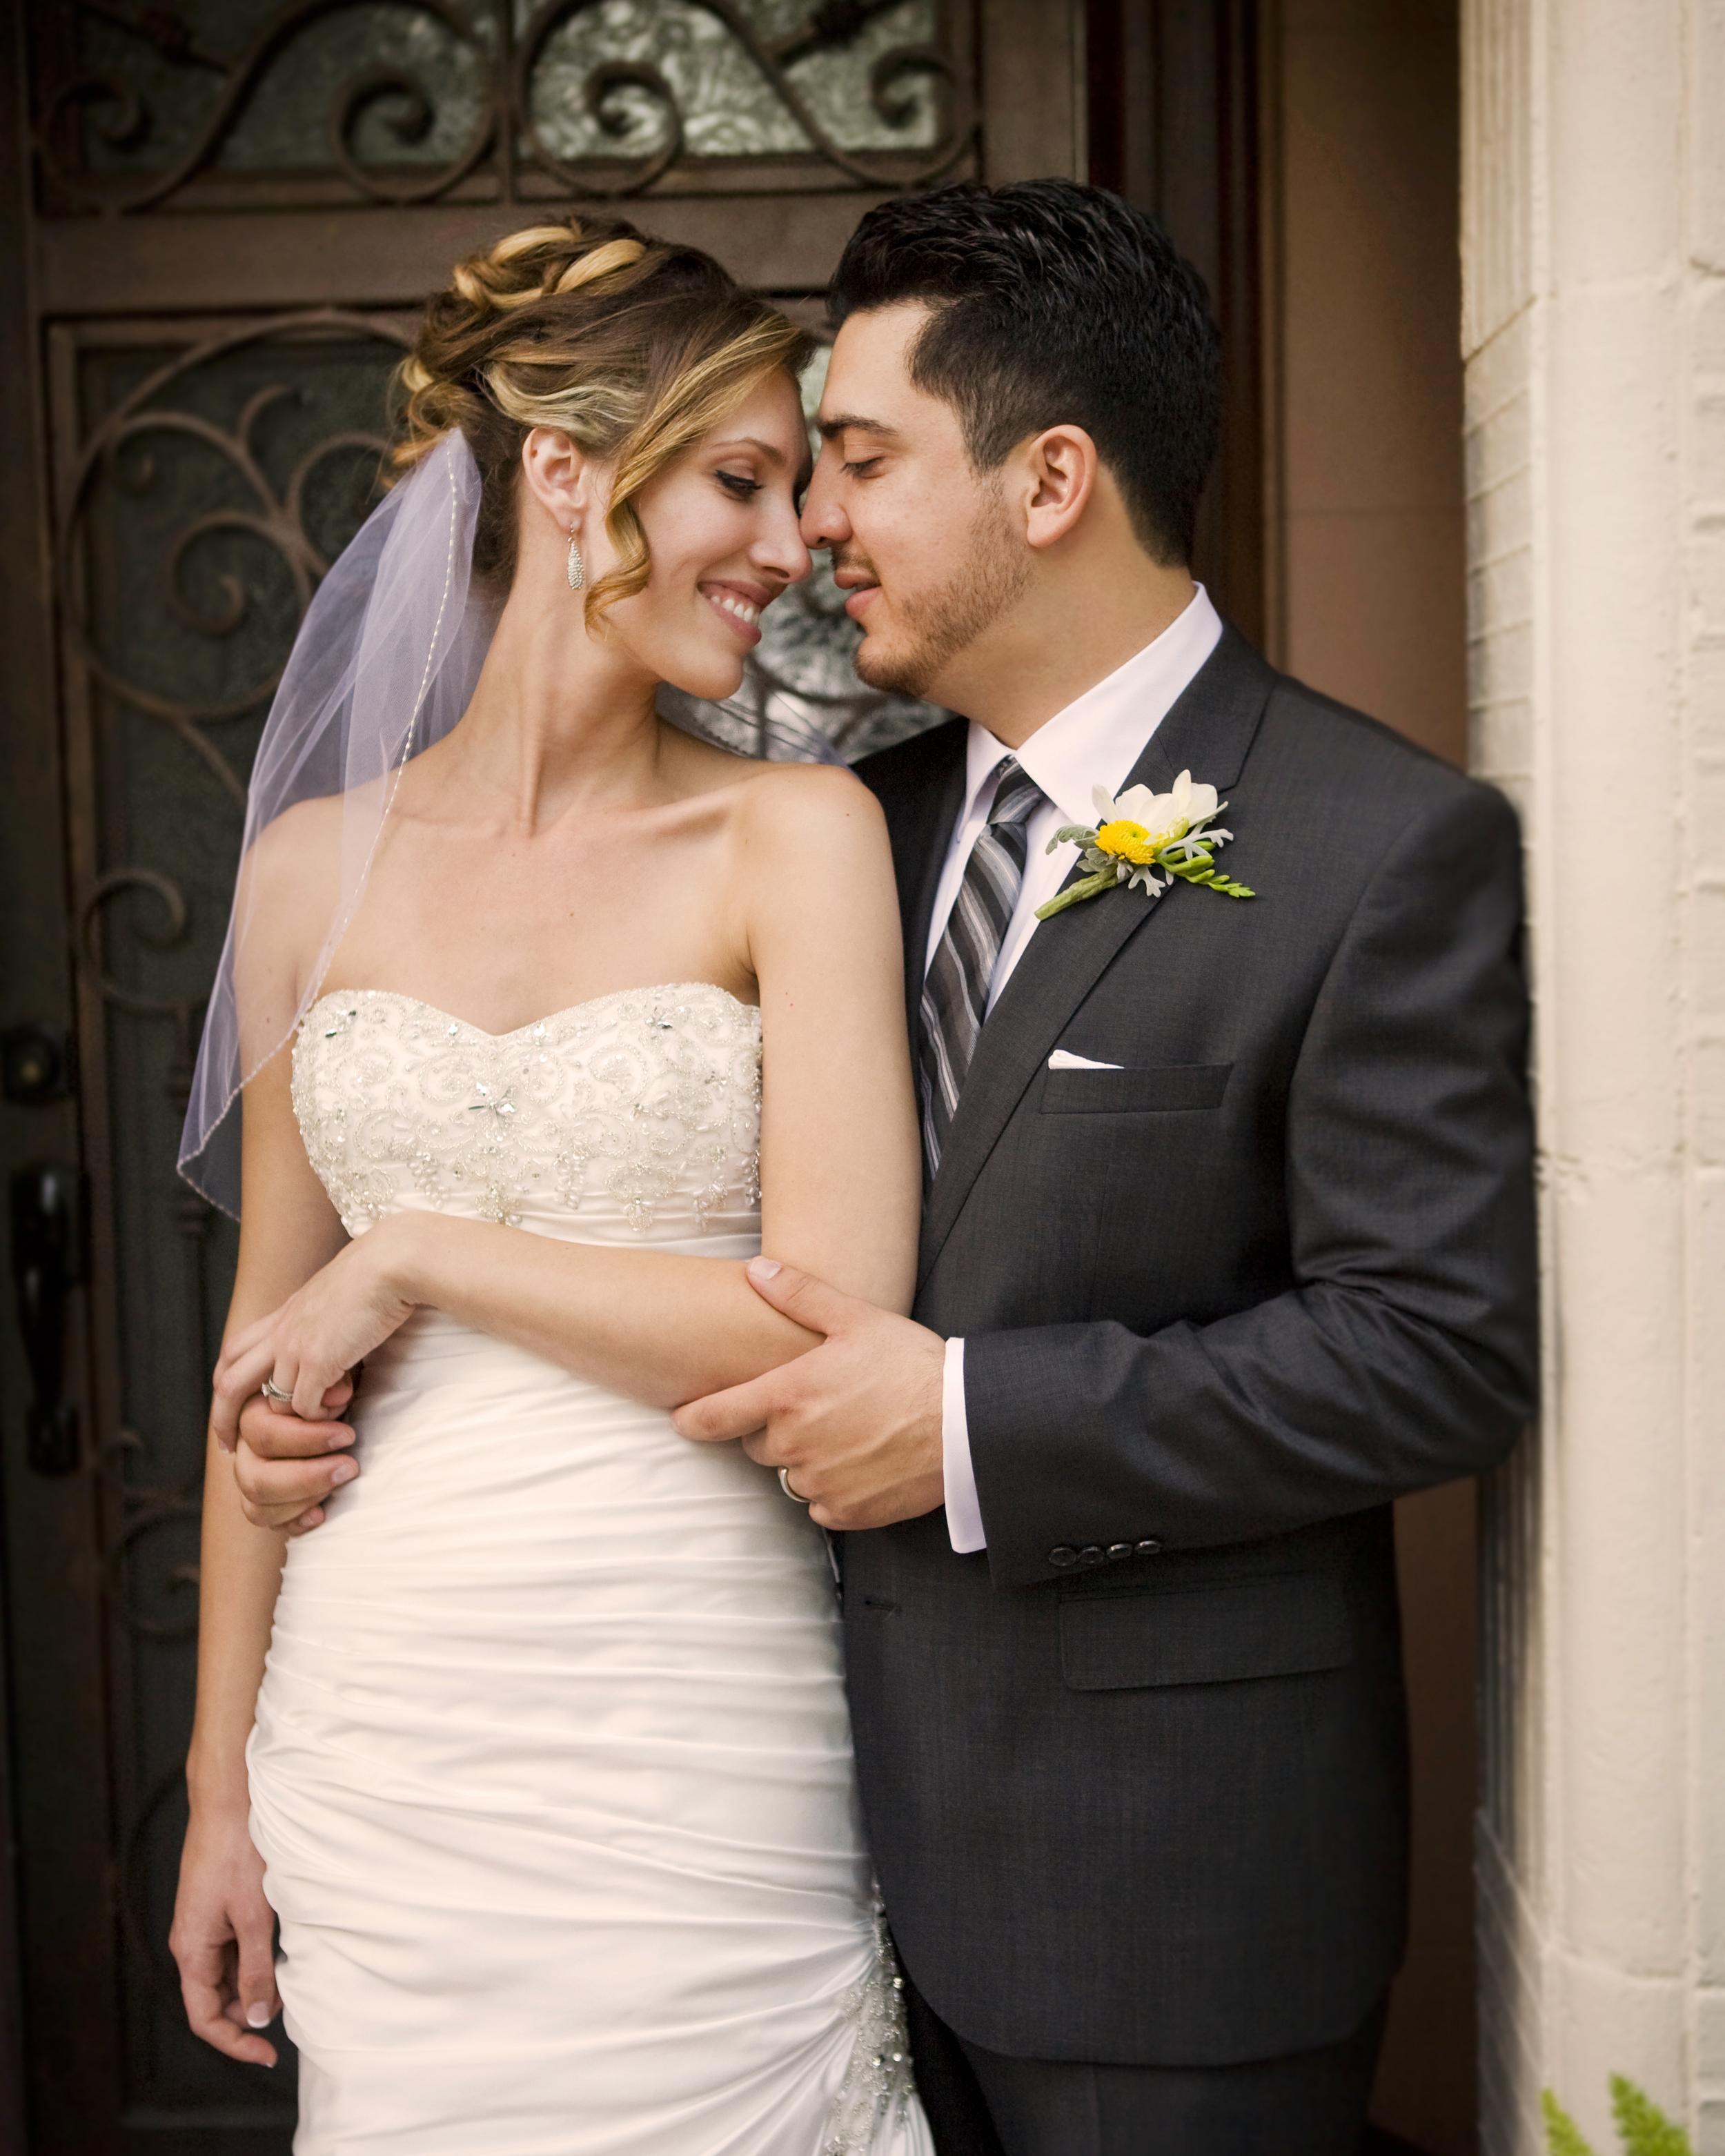 vacaville-wedding-photographer-13.jpg